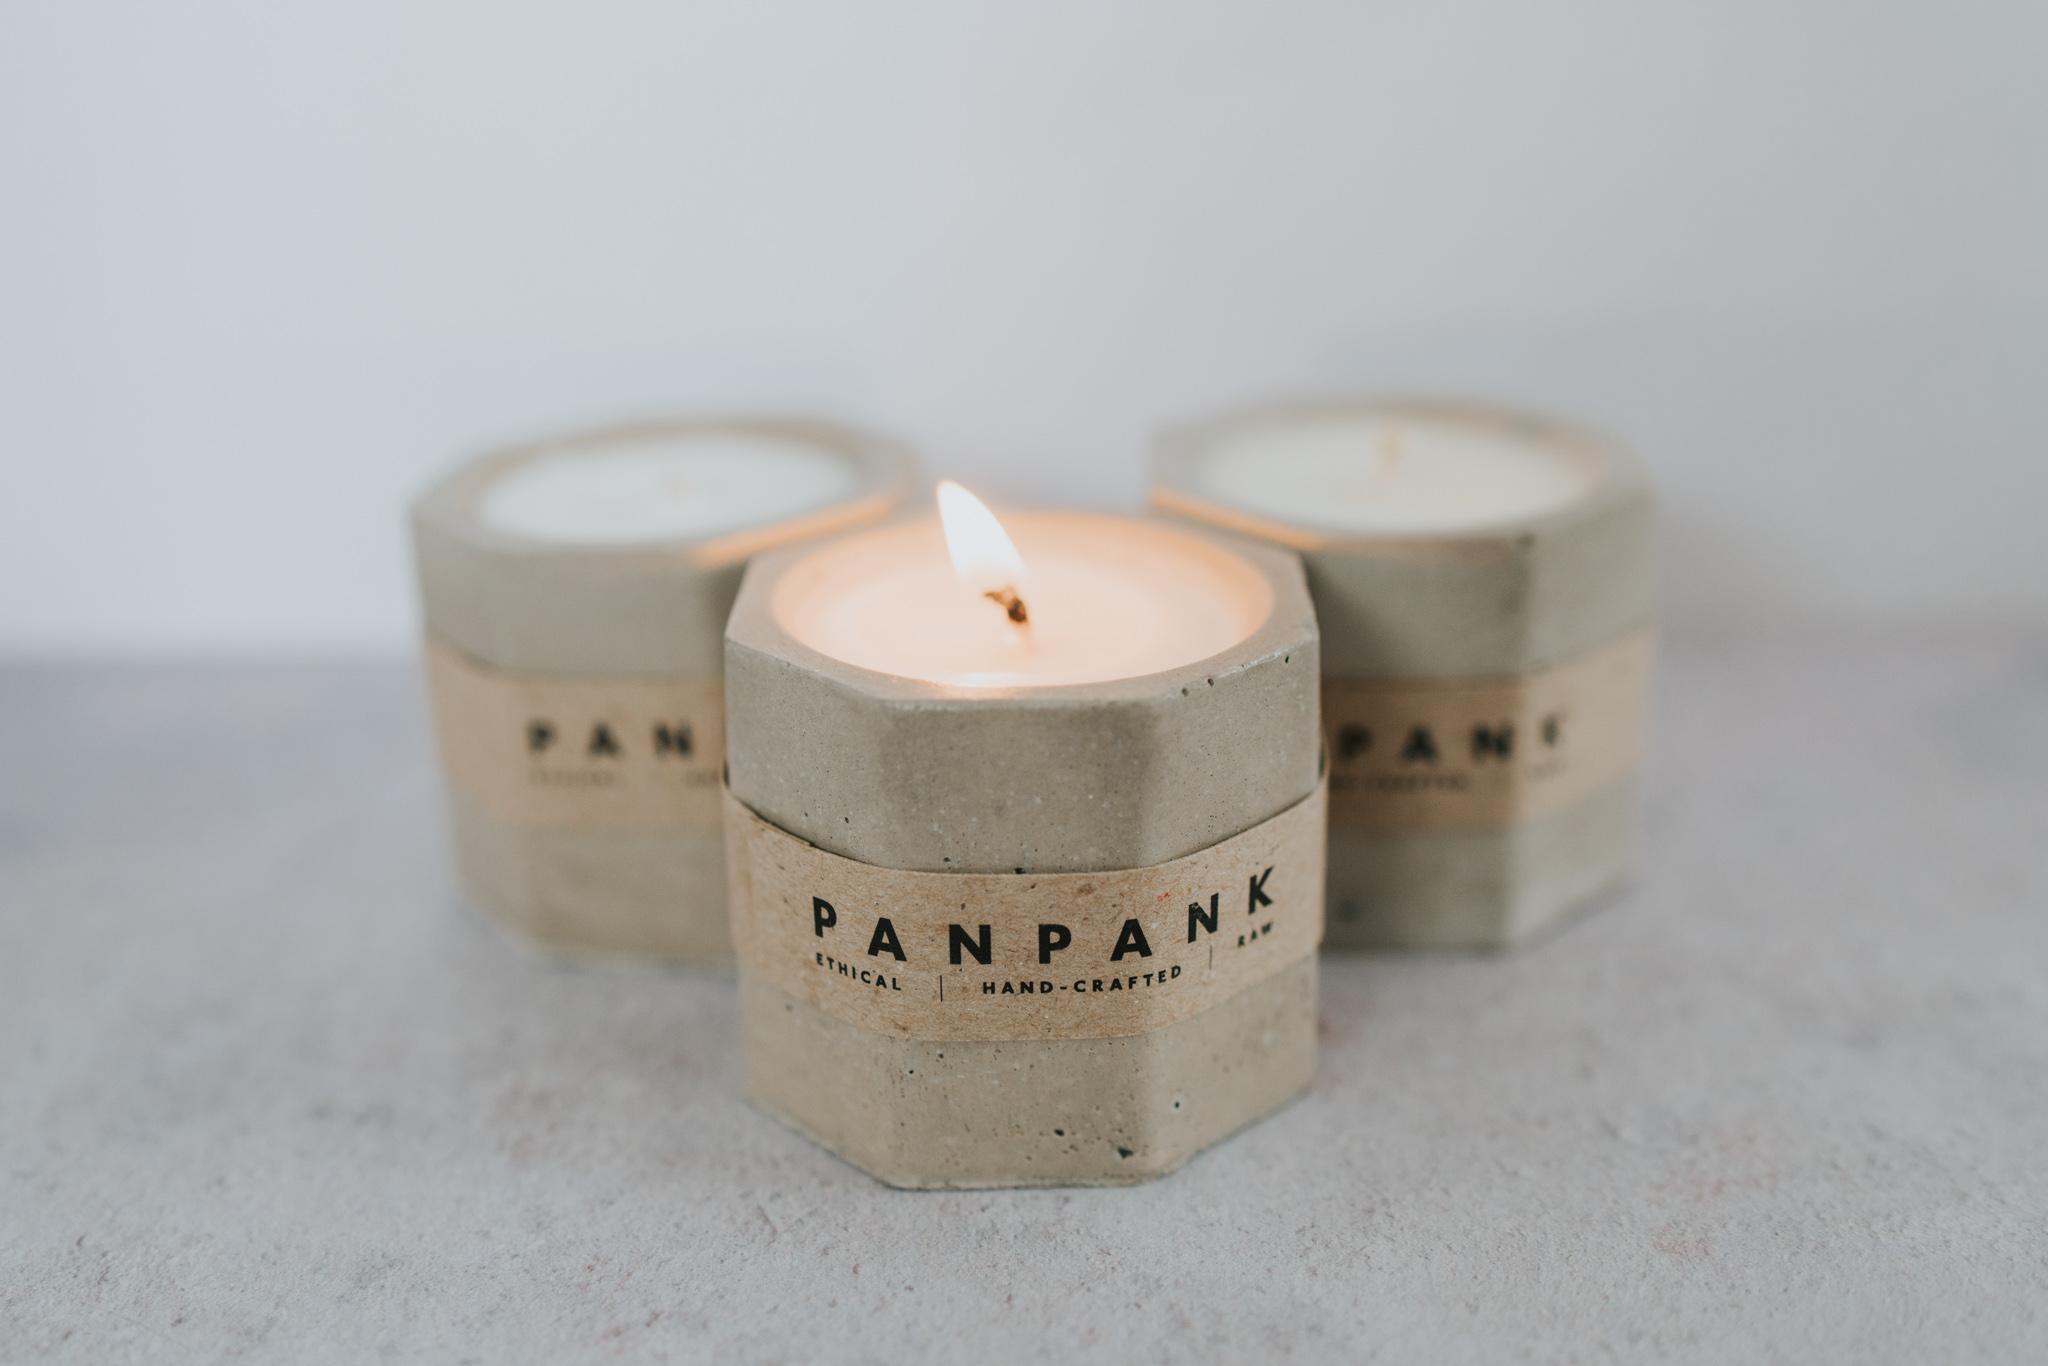 business-branding-panpank-candles-grace-elizabeth-colchester-essex-devon-suffolk-and-norfolk-alternative-wedding-and-family-photographer (17 of 19).jpg